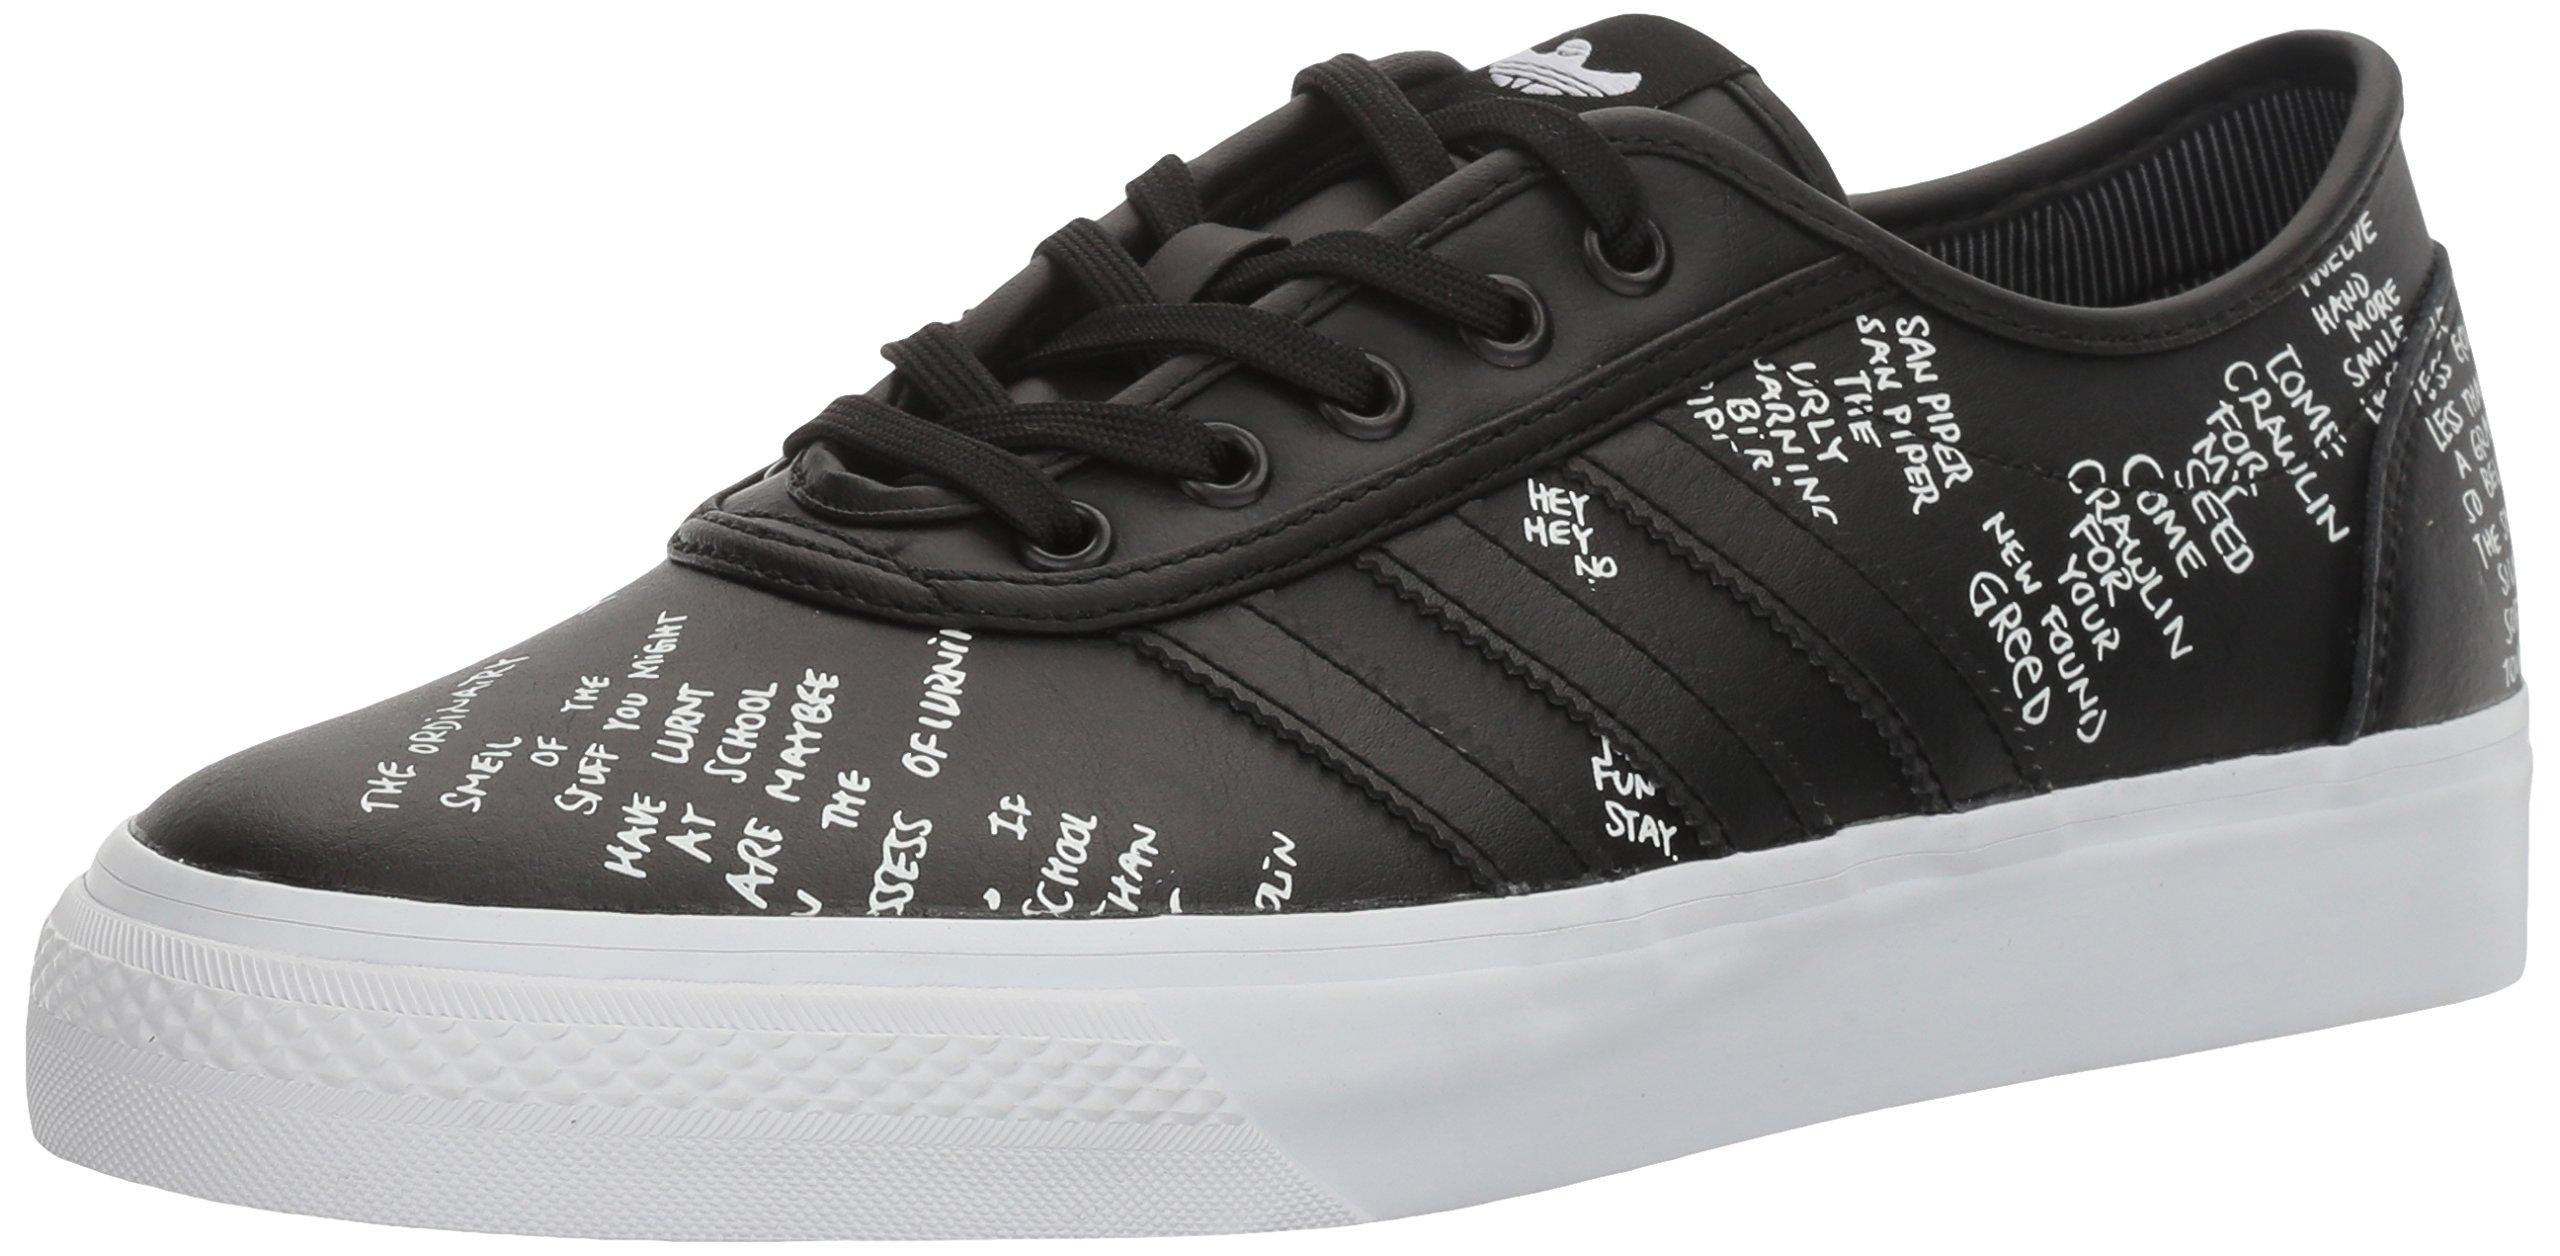 fluir Renacimiento Barriga  Adidas ORIGINALS Men's Adi-Ease Classified Fashion Sneakers- Buy Online in  Burkina Faso at burkinafaso.desertcart.com. ProductId : 167950766.